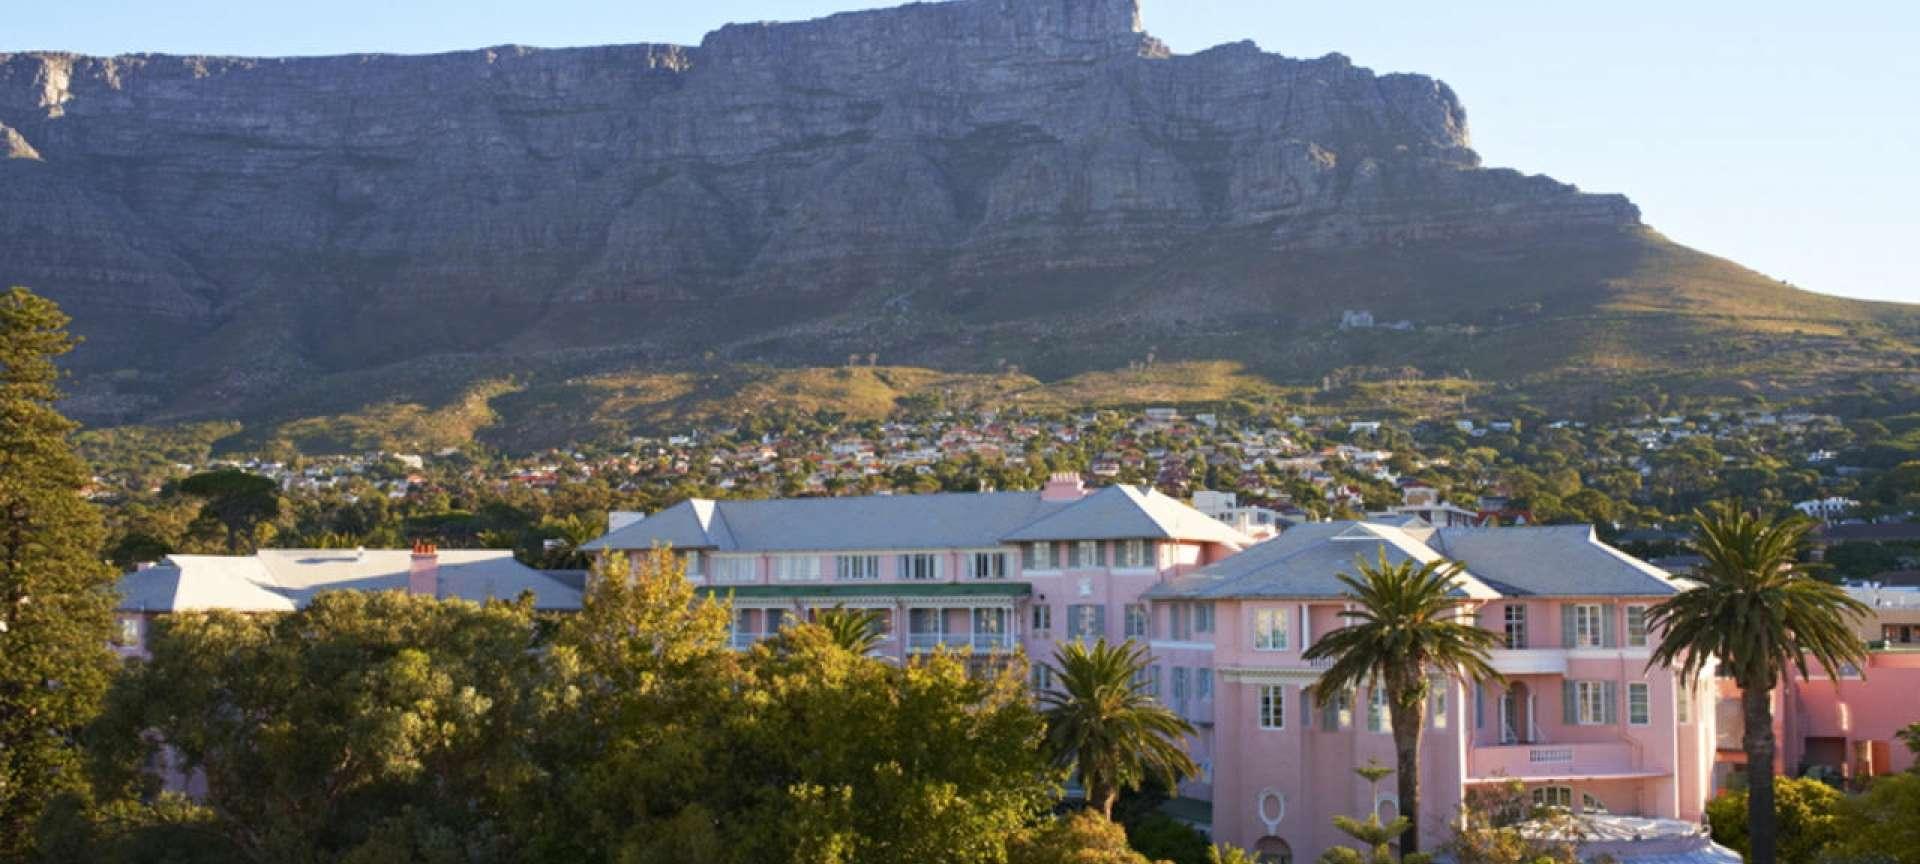 Cape Town City Bowl - Africa Wildlife Safaris